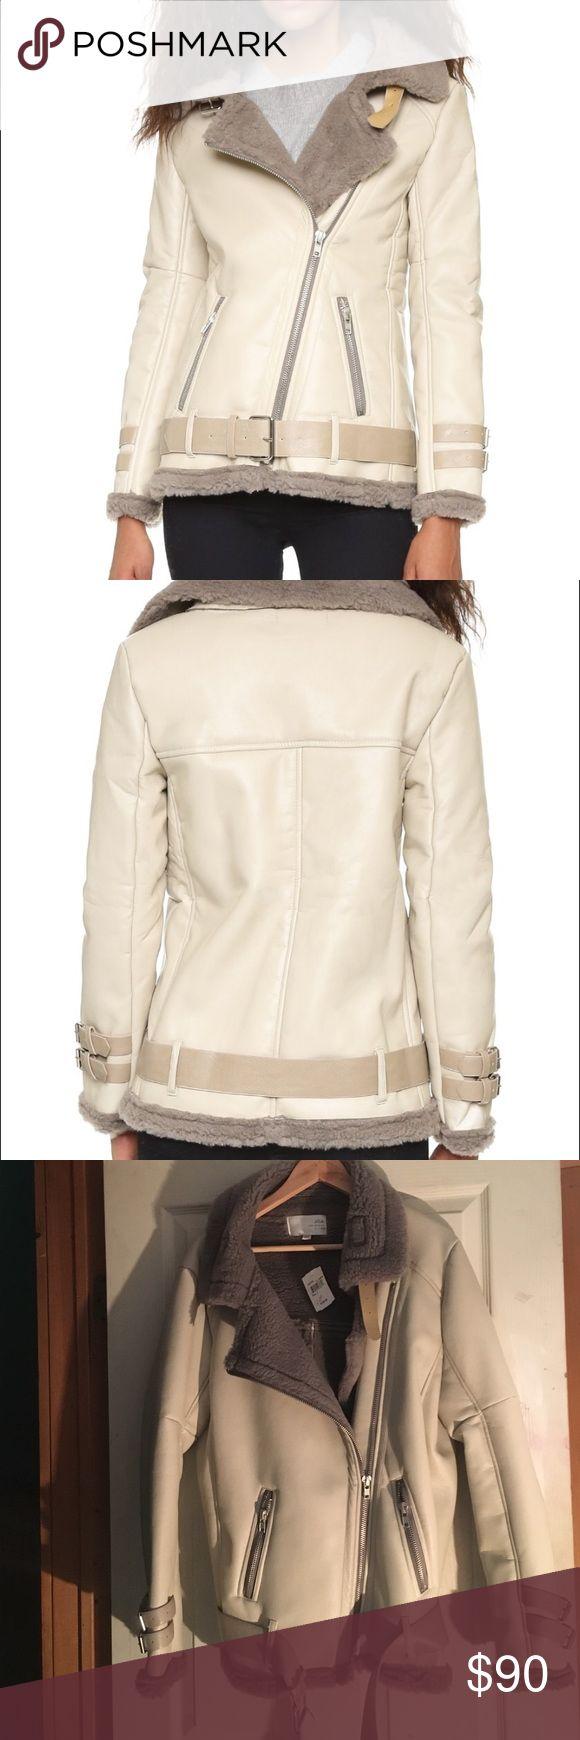 JOA Shearling Contrast Jacket Soft sherpa composes the